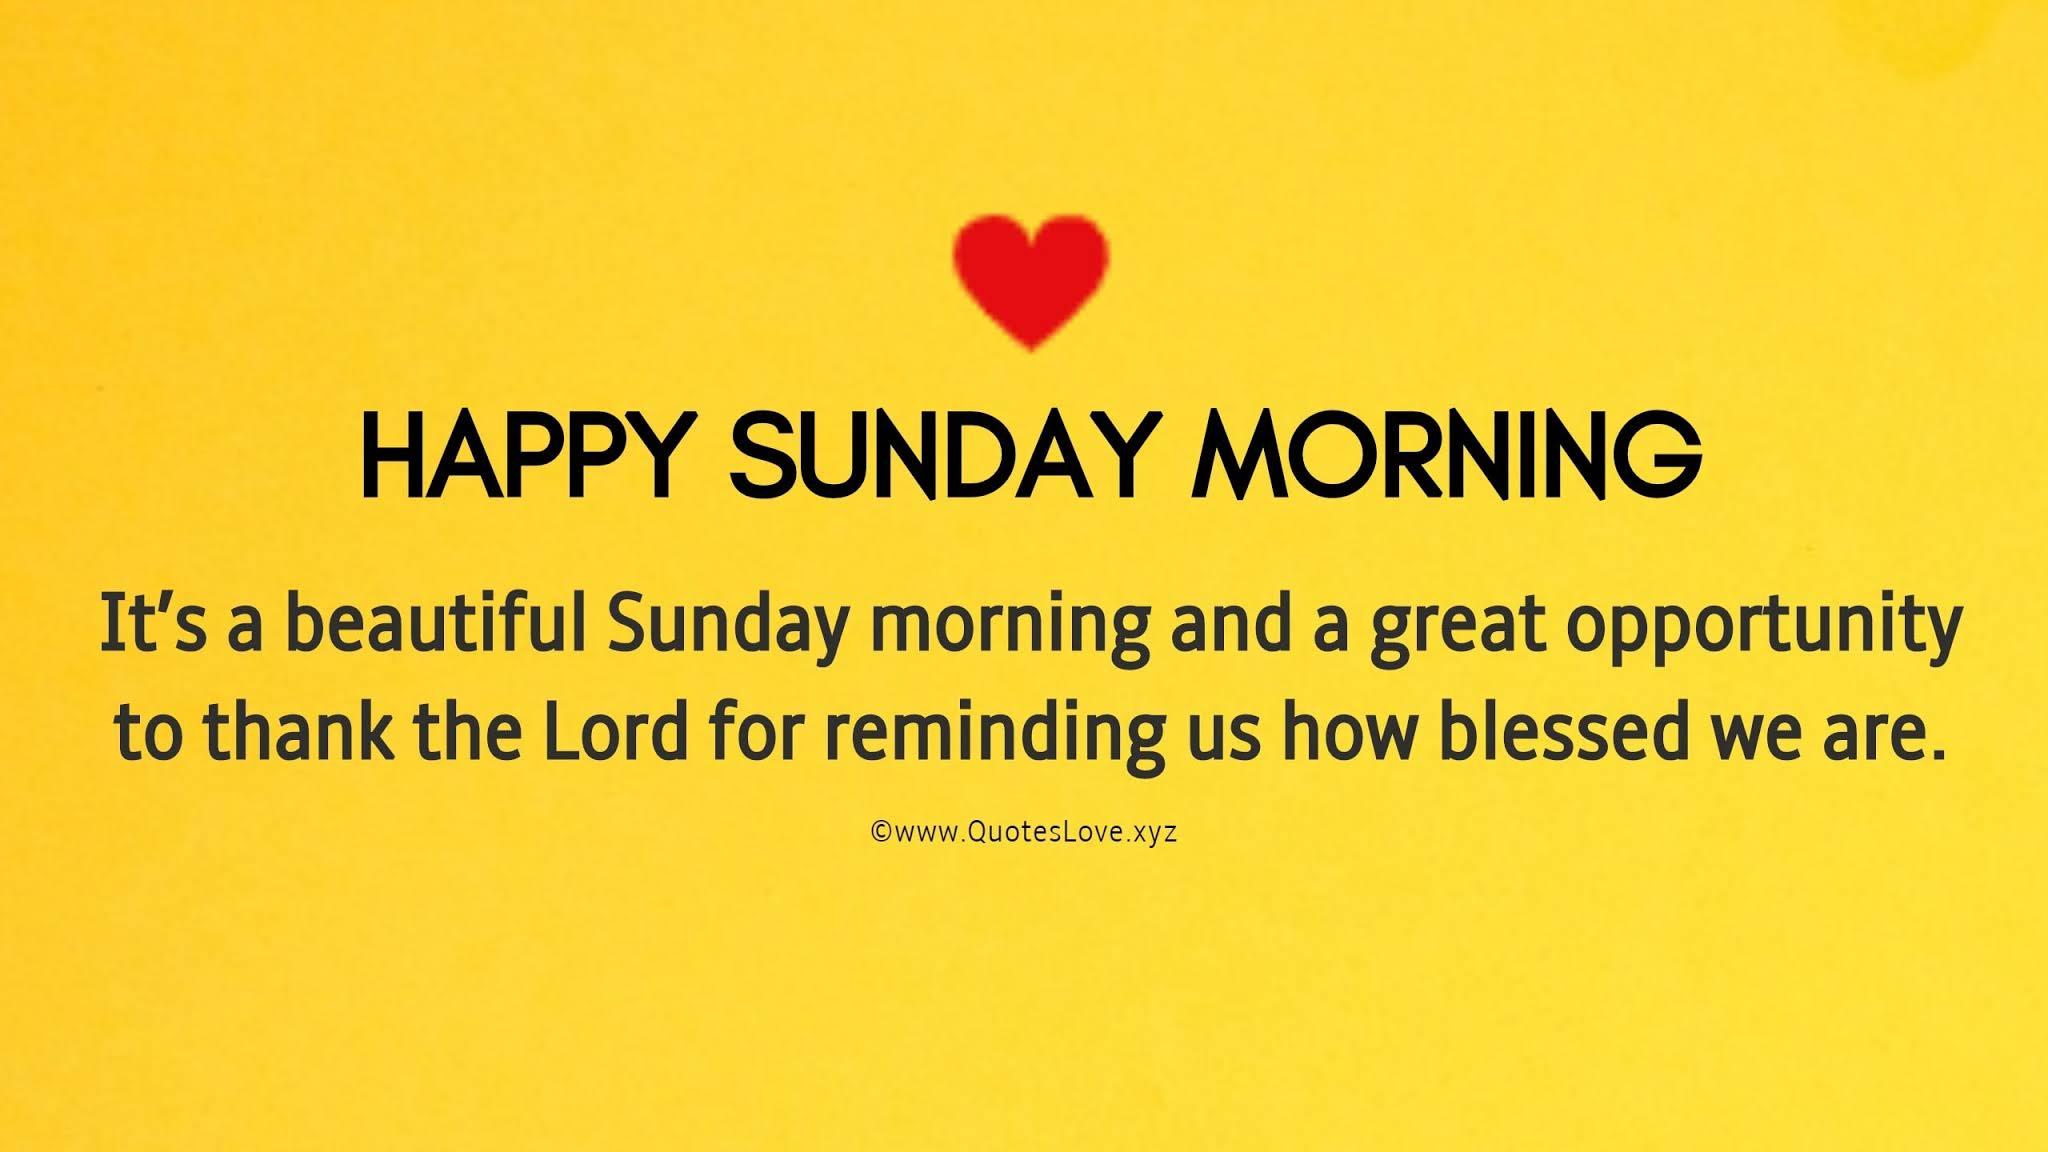 Sunday Good Morning Quotes To Celebrate Sunday Morning With Happiness & Joy